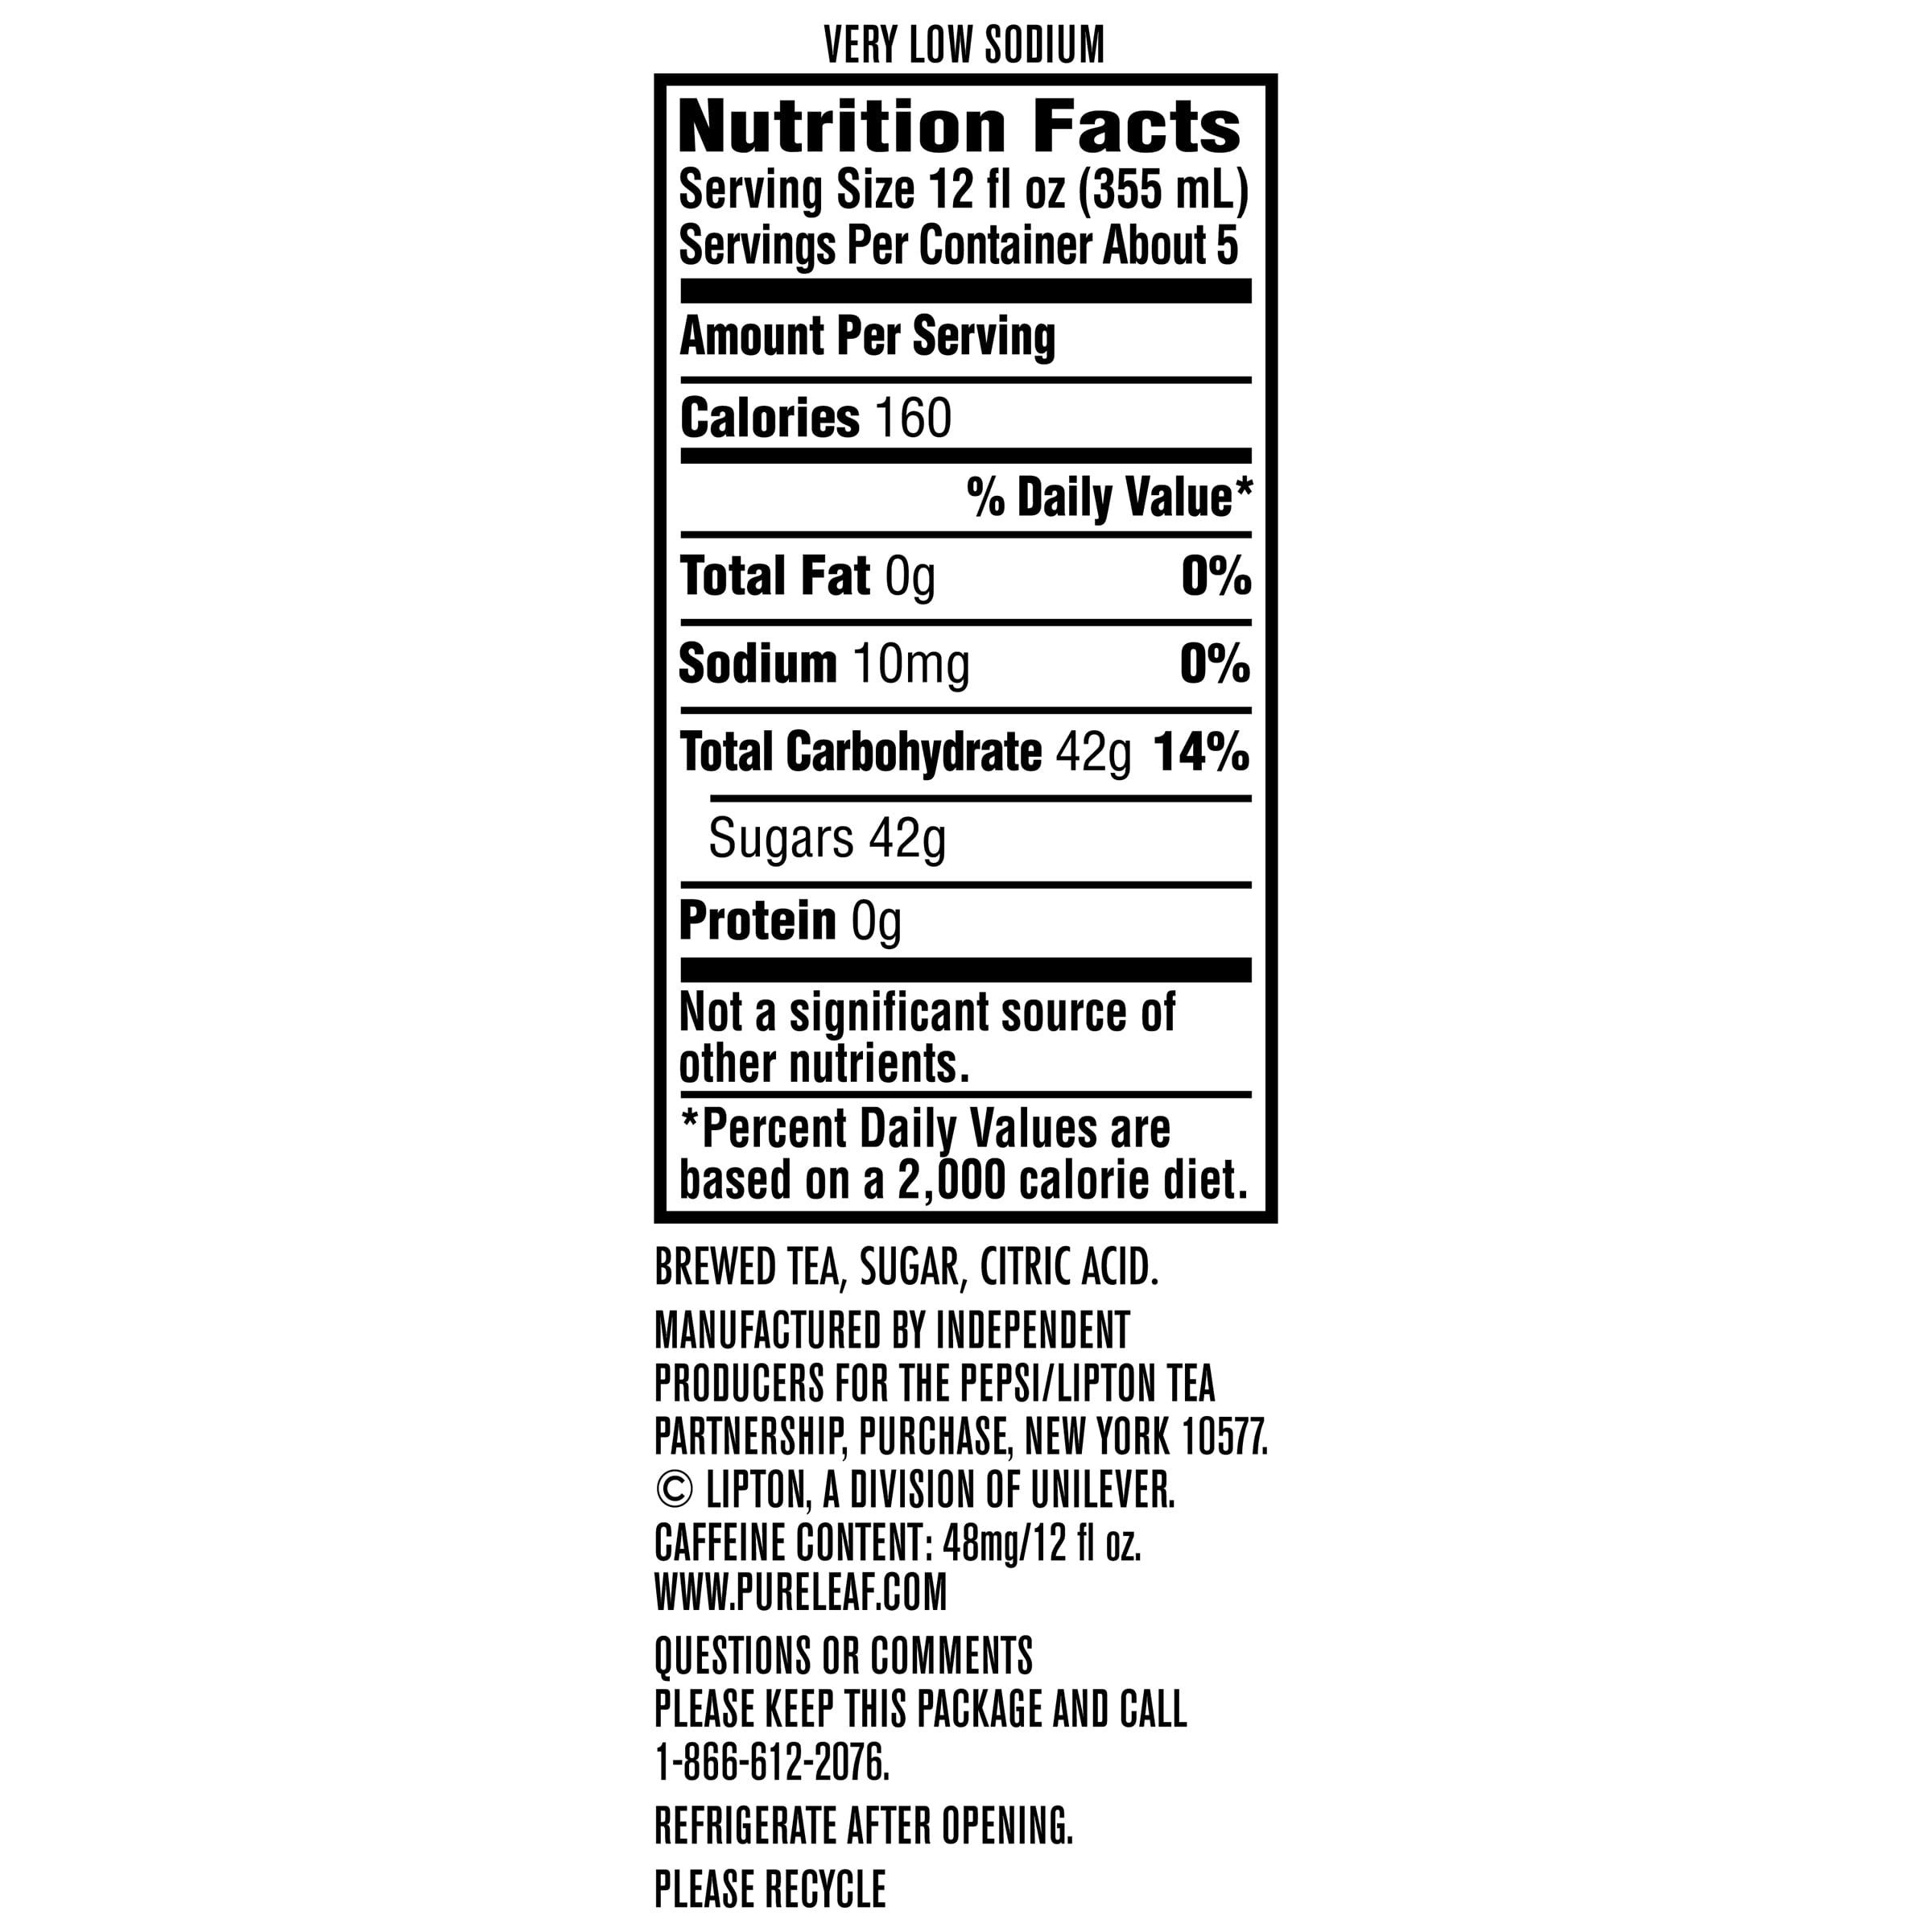 Pure Leaf Sweet Tea Nutrition Label